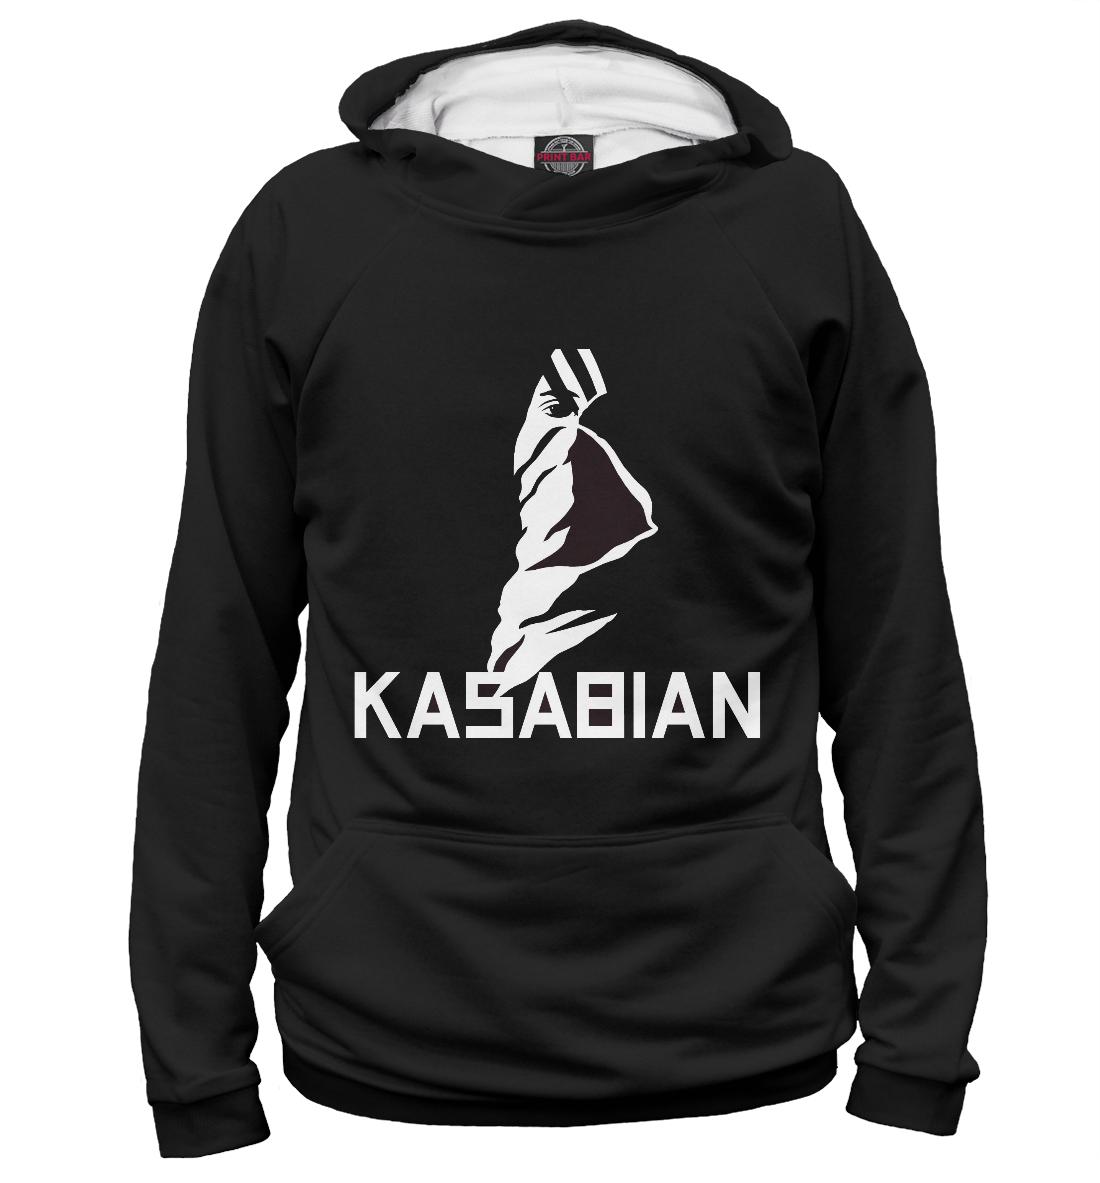 Купить Kasabian, Printbar, Худи, KSB-132155-hud-1